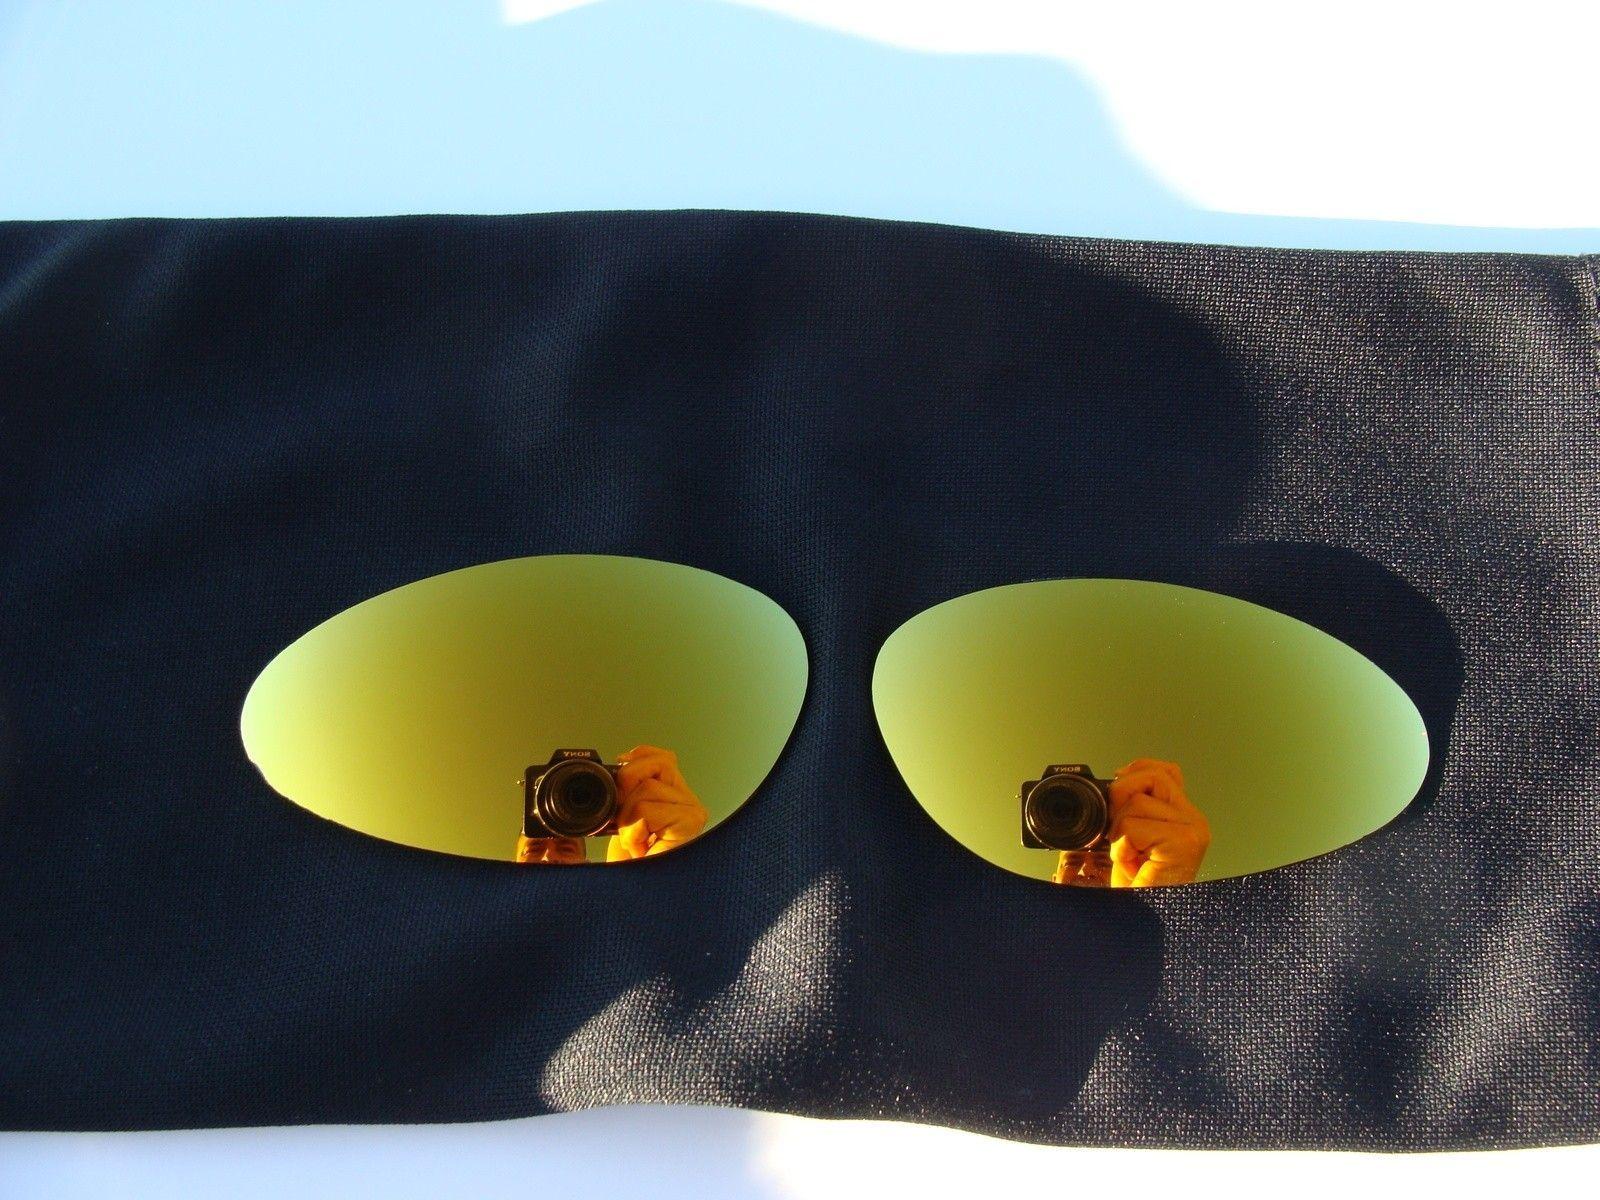 Custom Cut (Oakley) Lenses For Penny 10/011: 24k Polar, Red/Purple, Jade, Blue, Fire - DSC04600.JPG